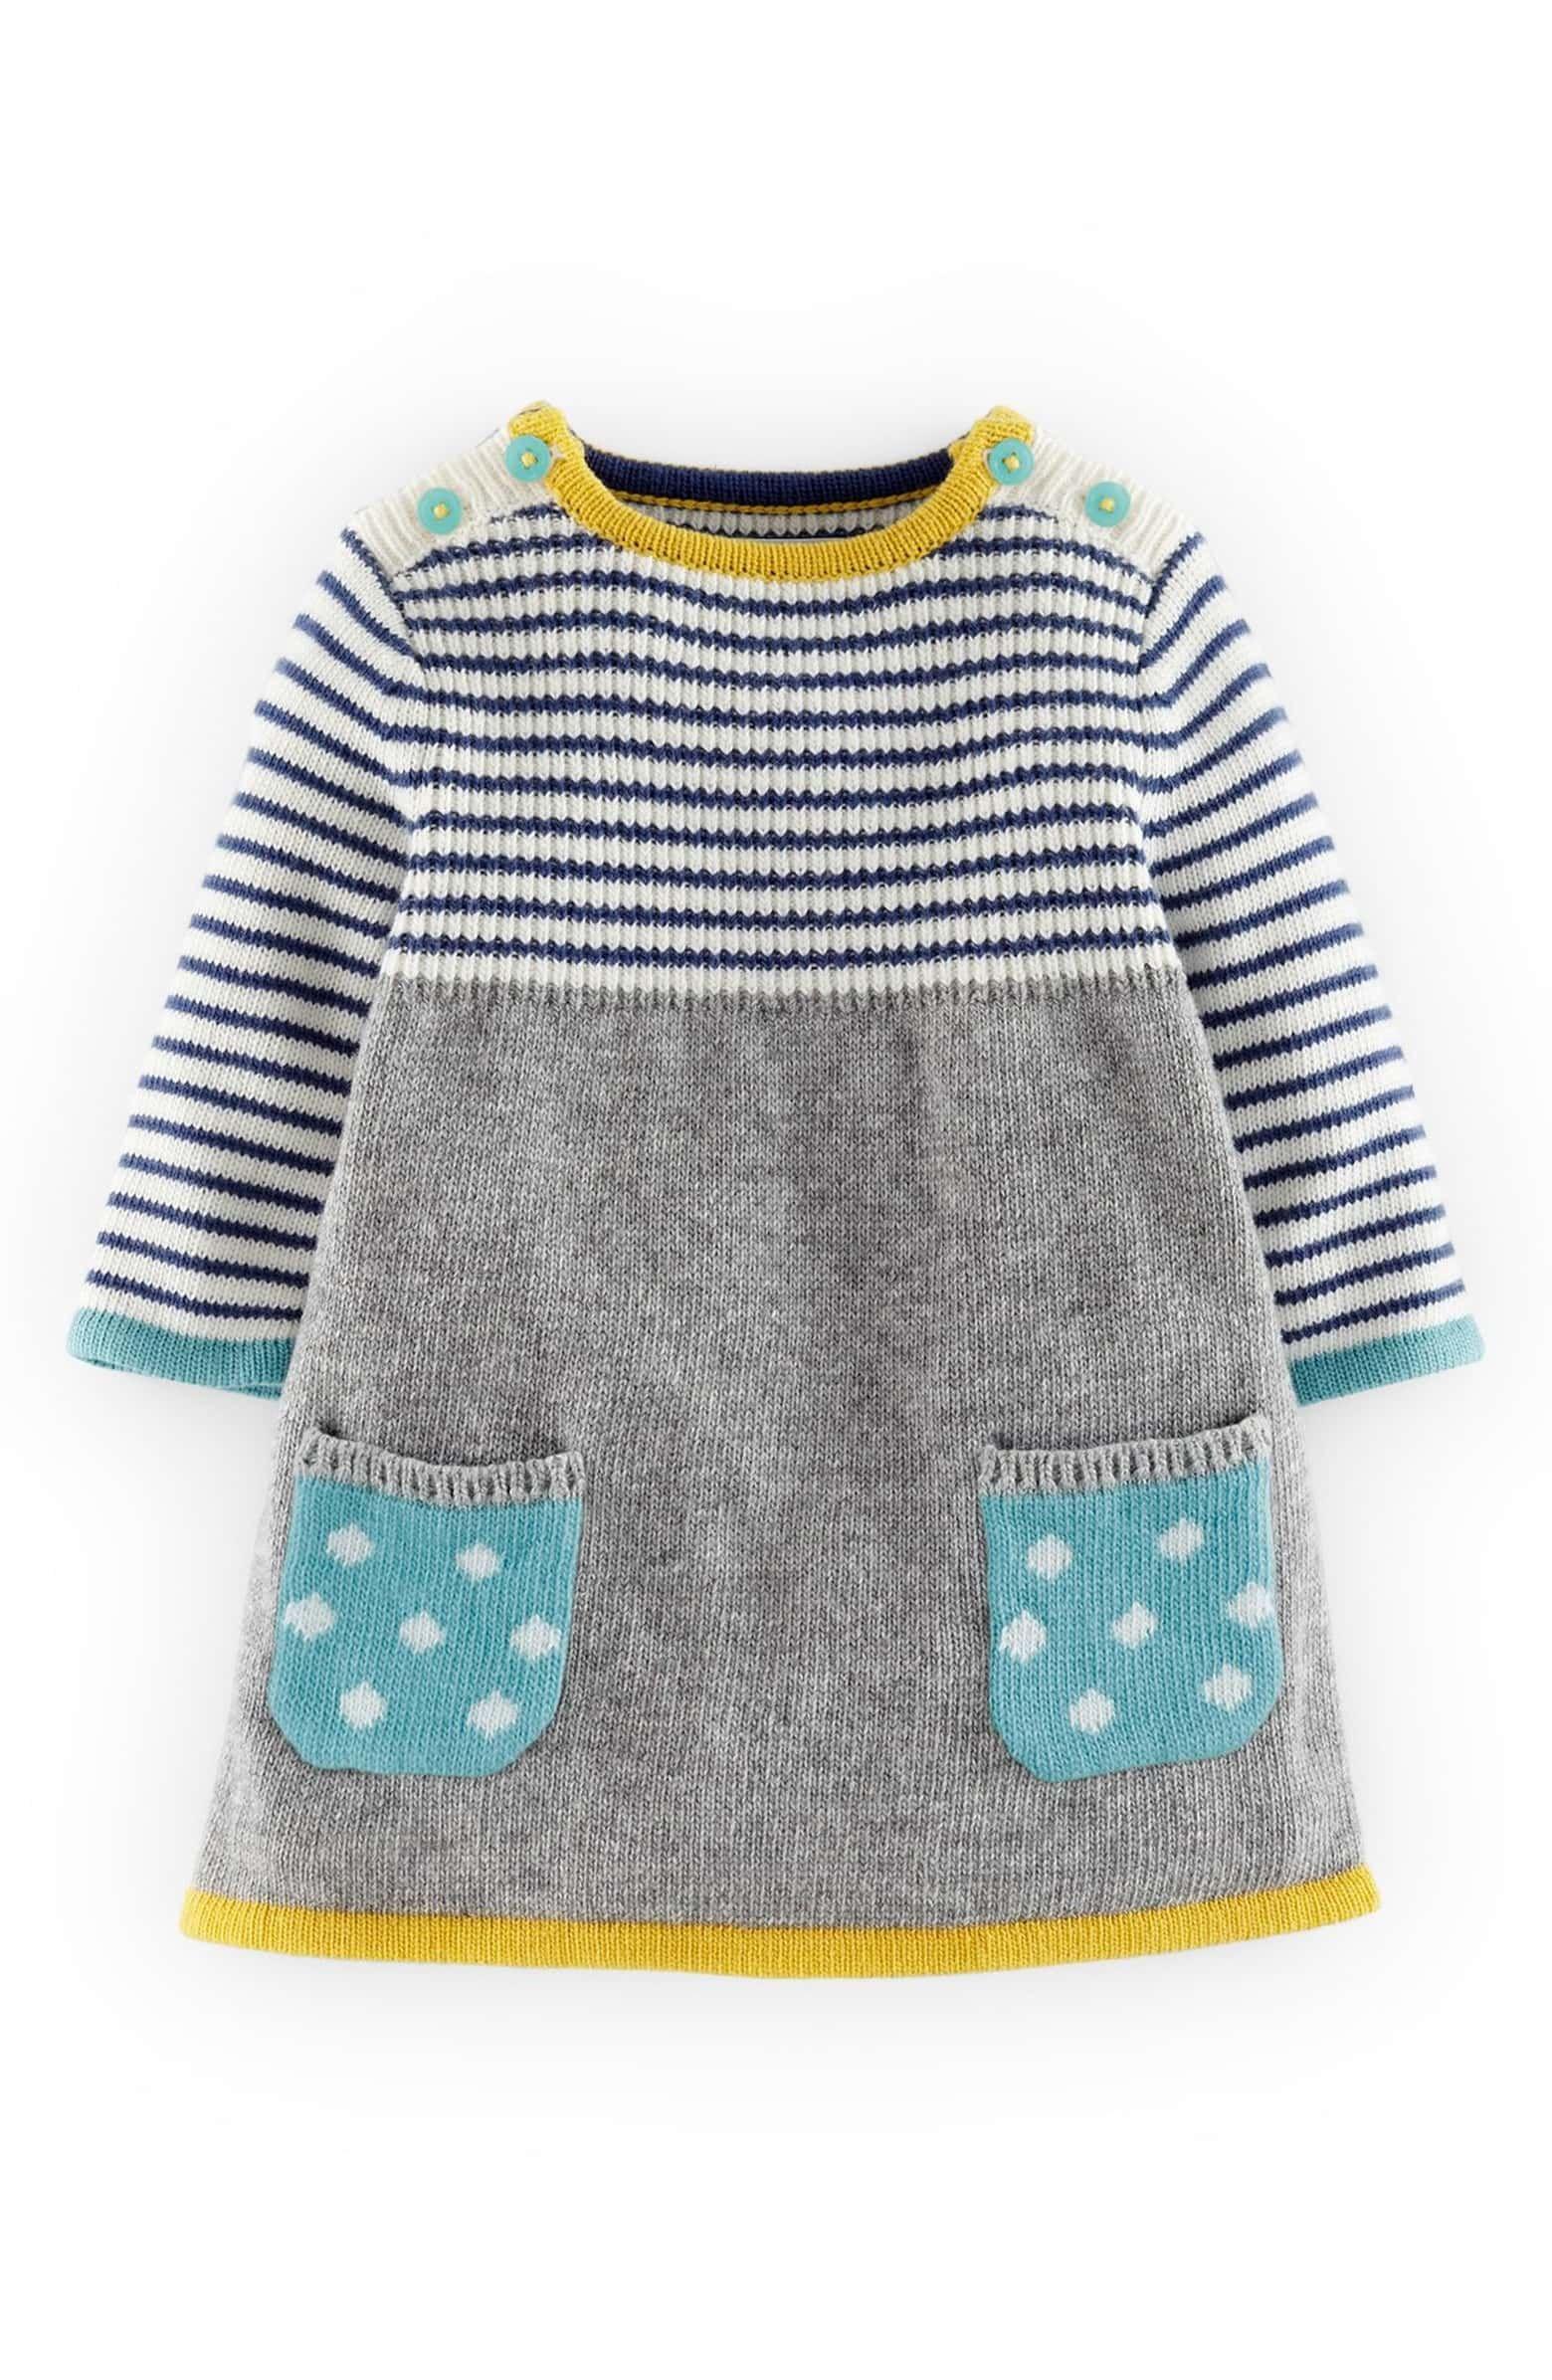 a2d01ec26658 Sweet Knit Sweater Dress